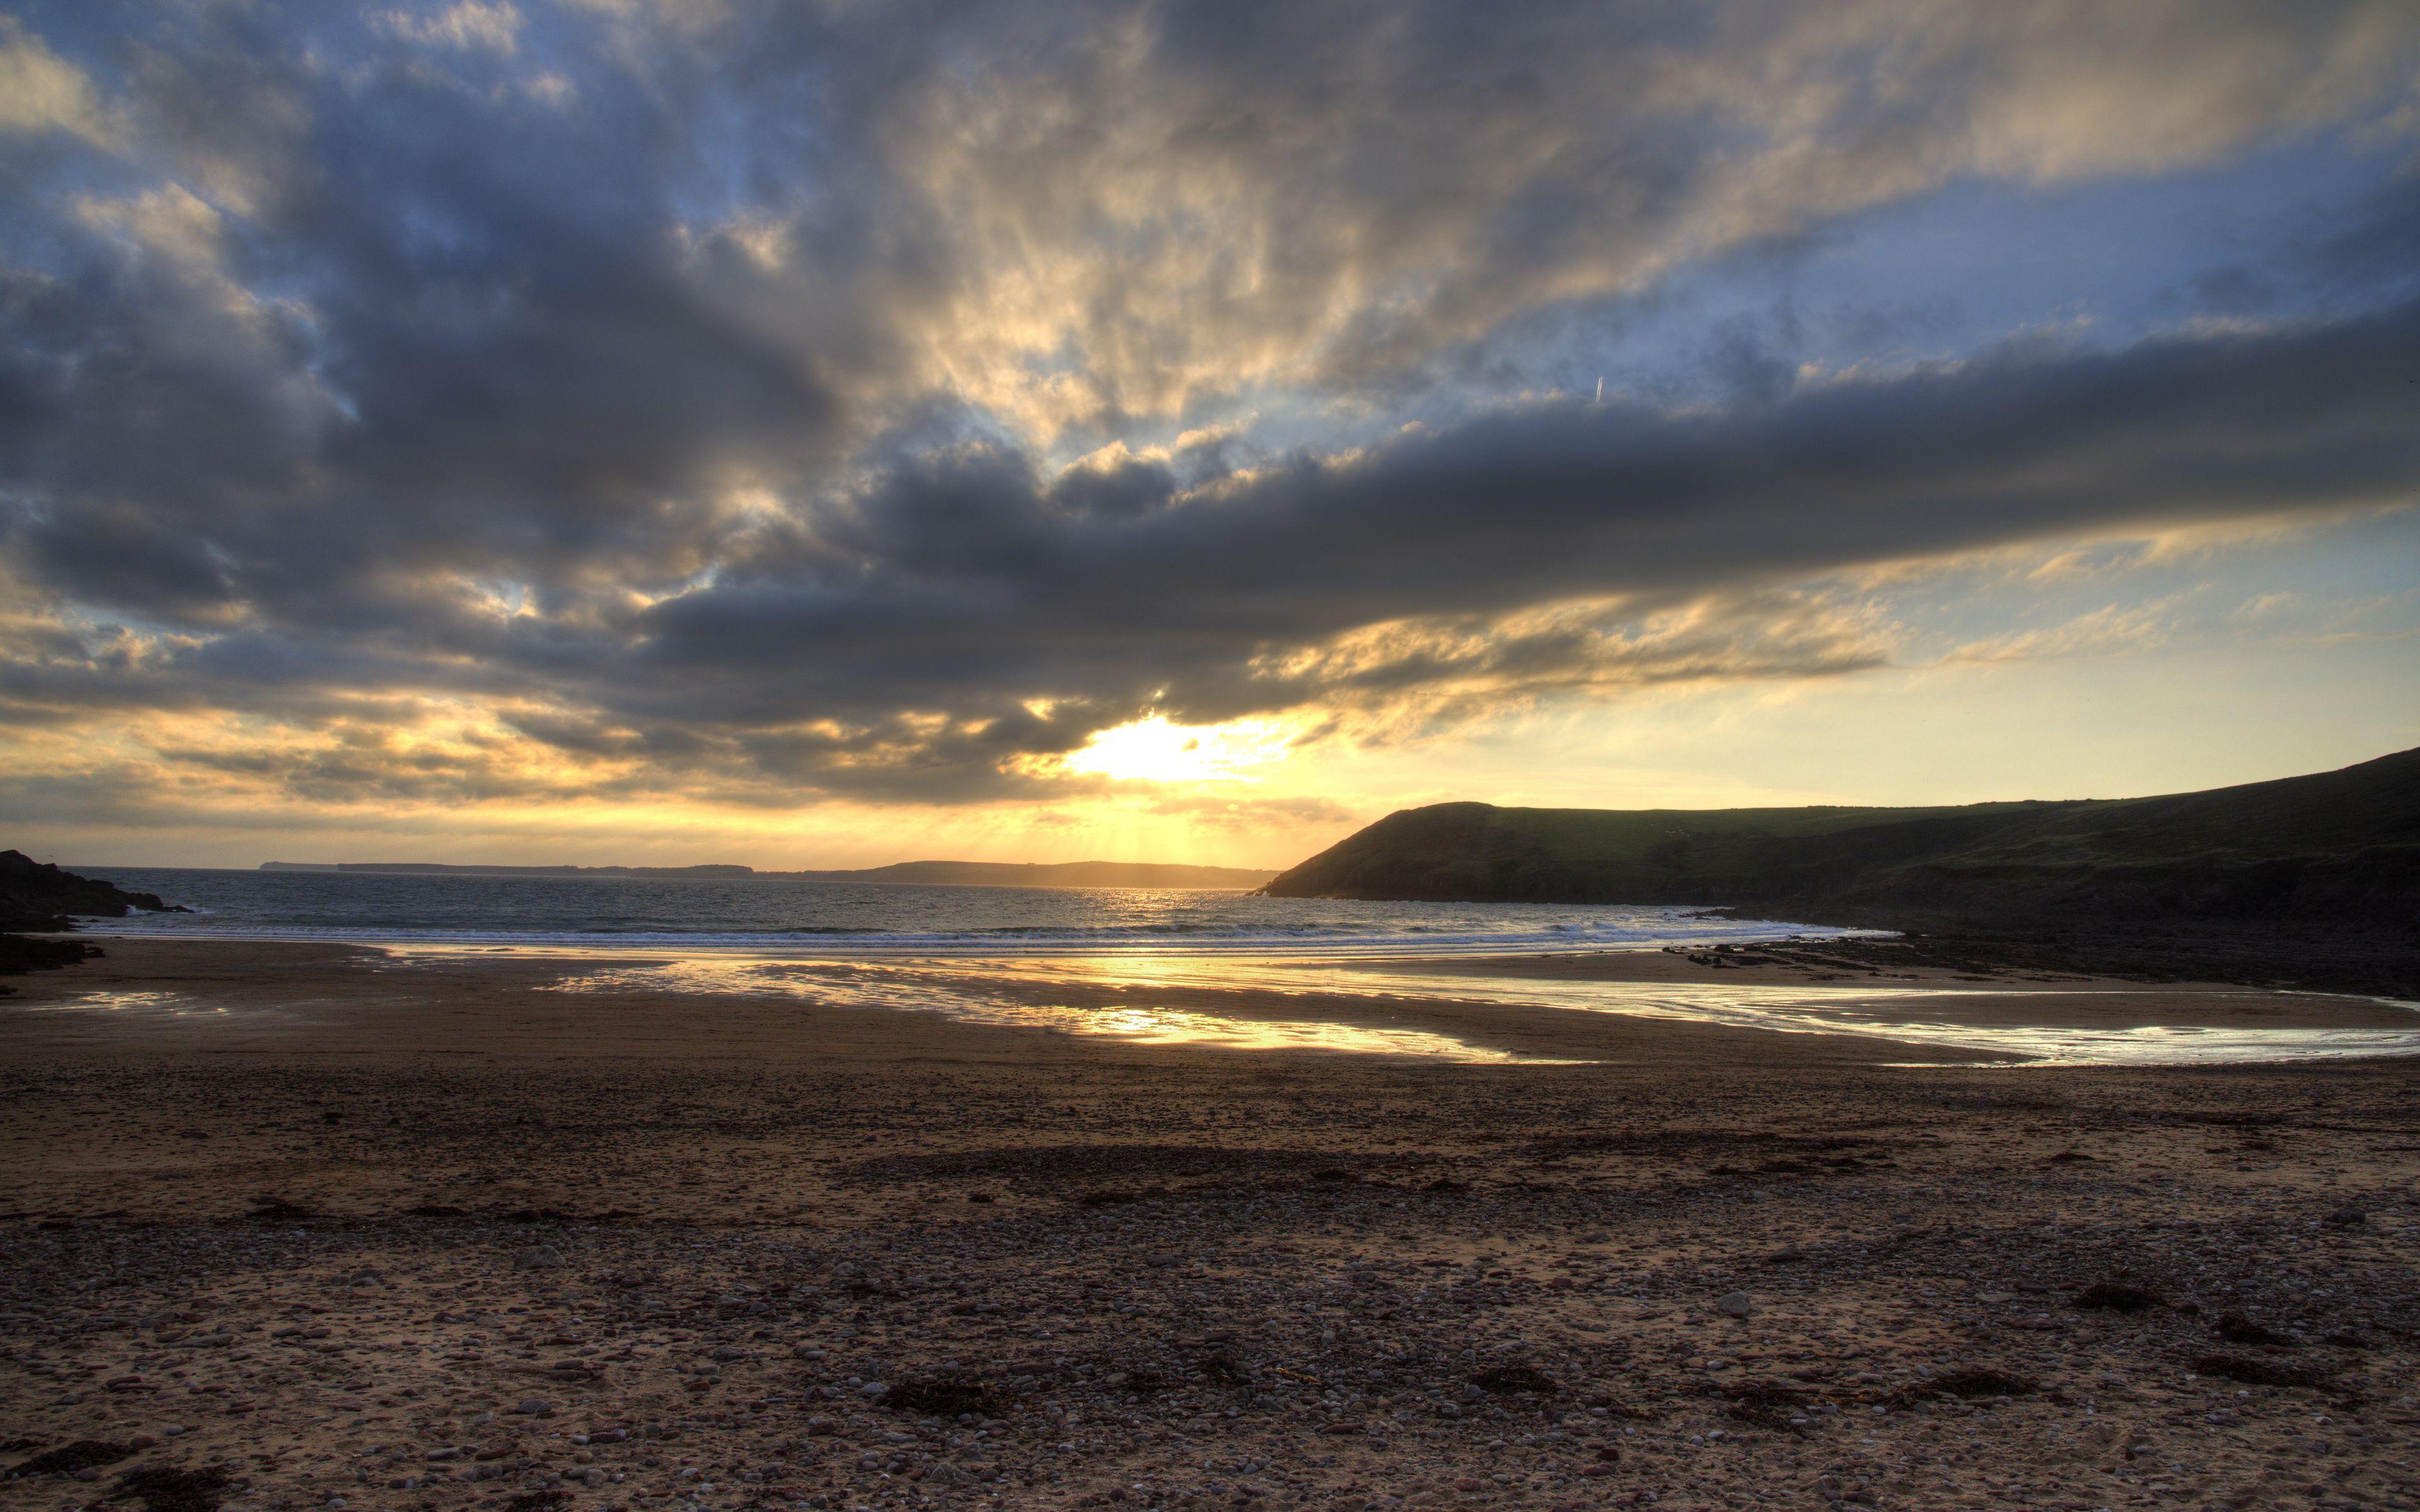 3840x2400 Wallpaper shore, water, sunset, landscape